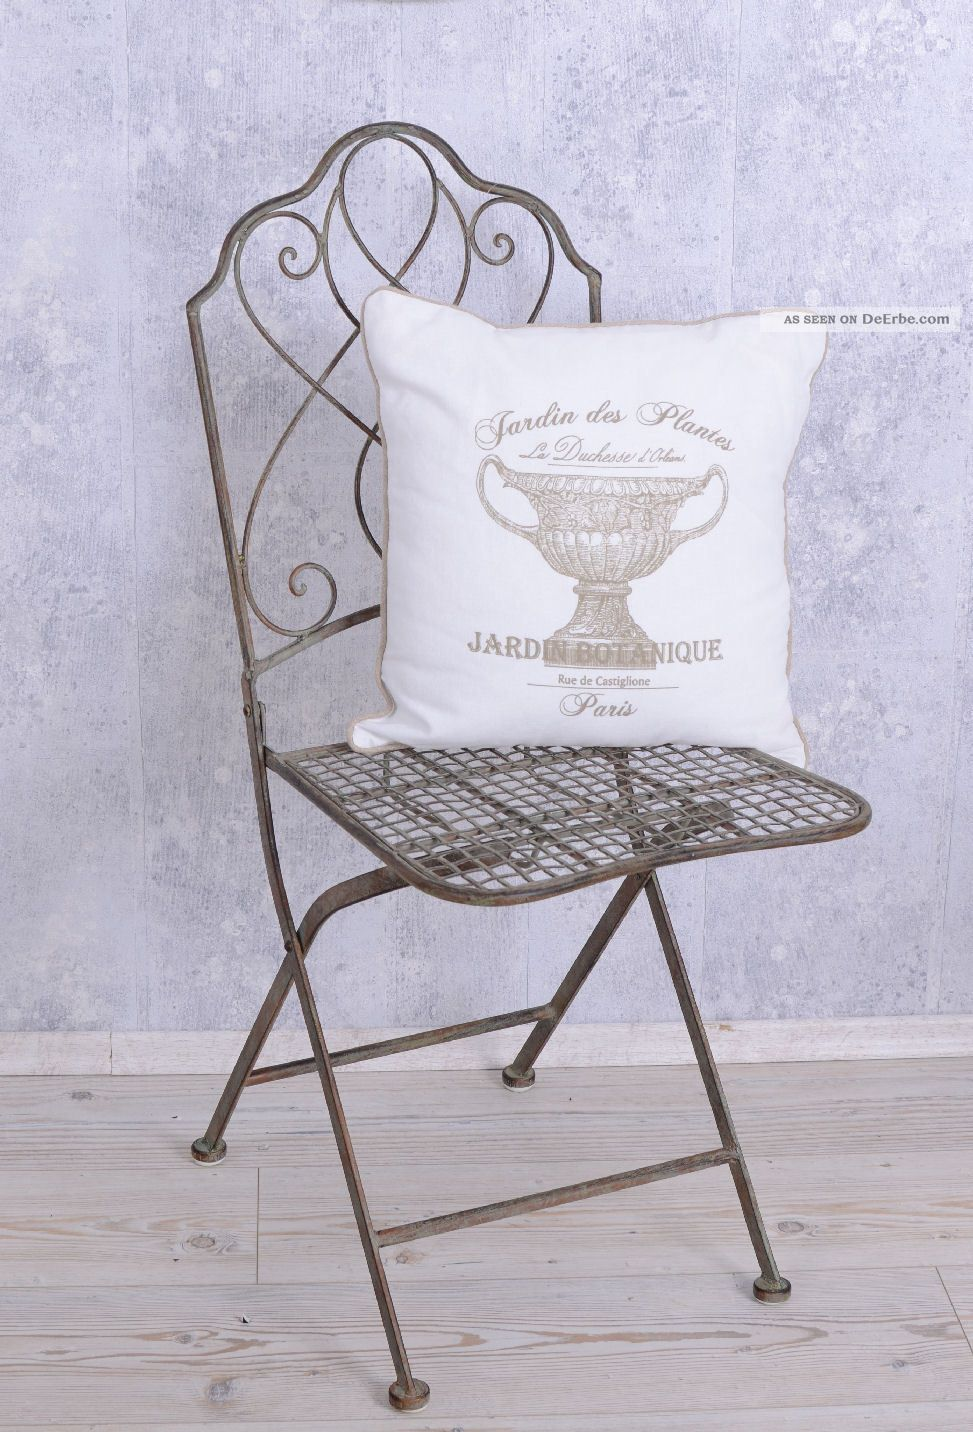 eisenstuhl landhausstil garten stuhl gartenm bel antik. Black Bedroom Furniture Sets. Home Design Ideas